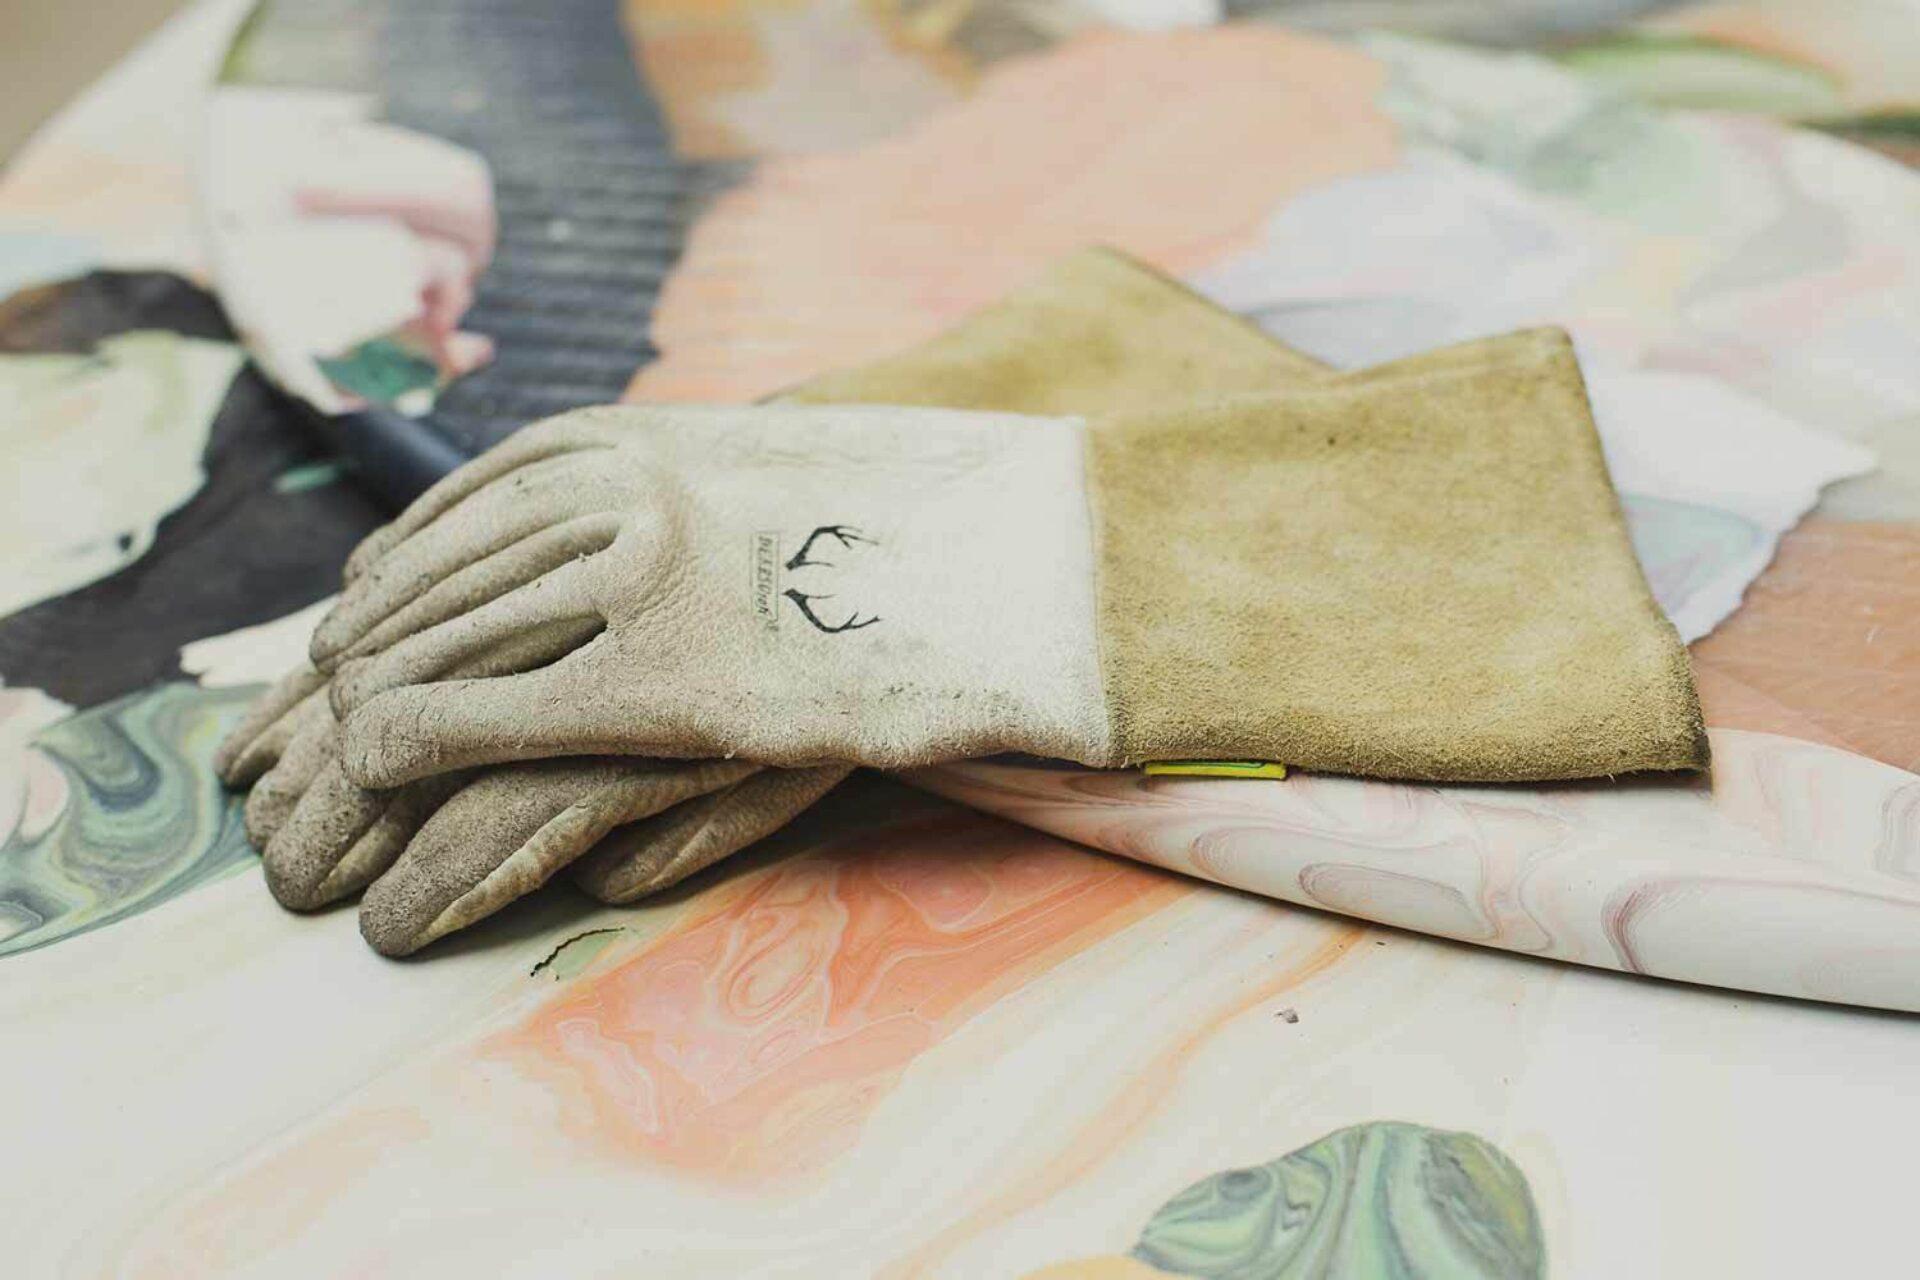 Kooij gloves meltingpot table recycled plastic workshop